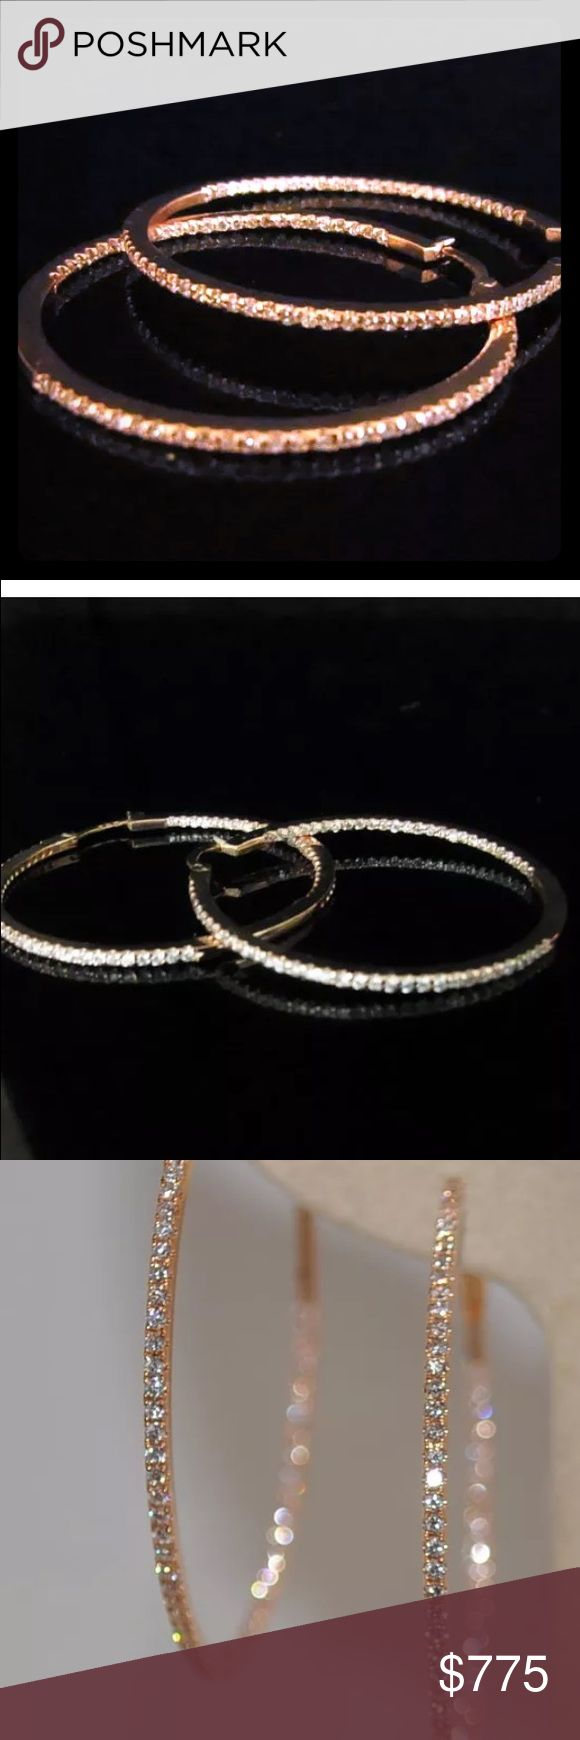 1.05 carat 14k rose gold diamond hoop earrings 1.05 carat 14k rose gold diamond hoop earrings Jewelry Earrings